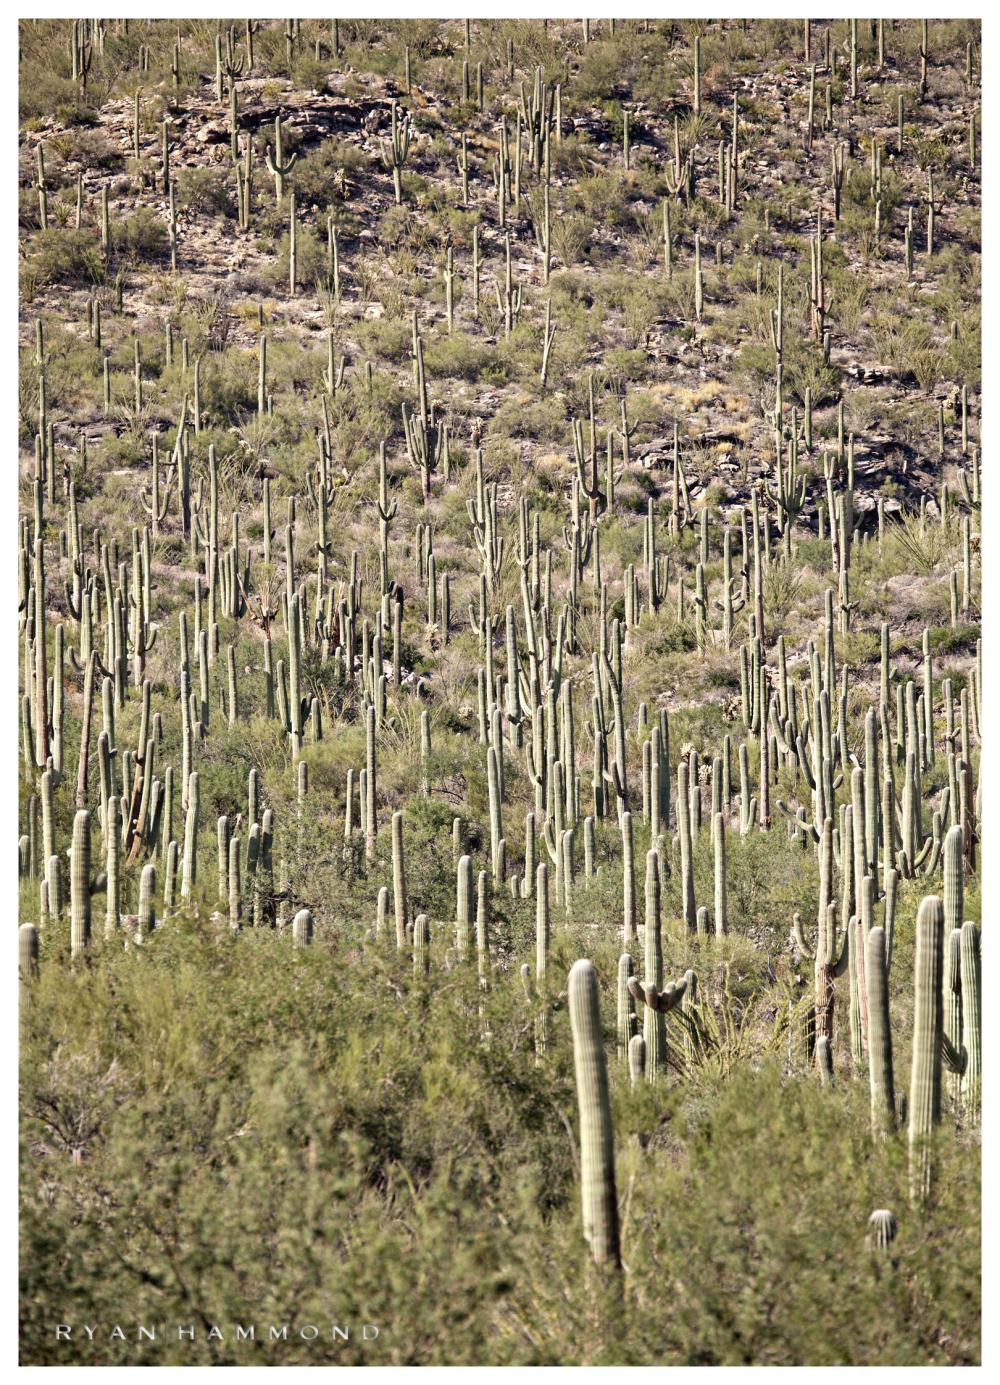 Tucson photographer Ryan Hammond